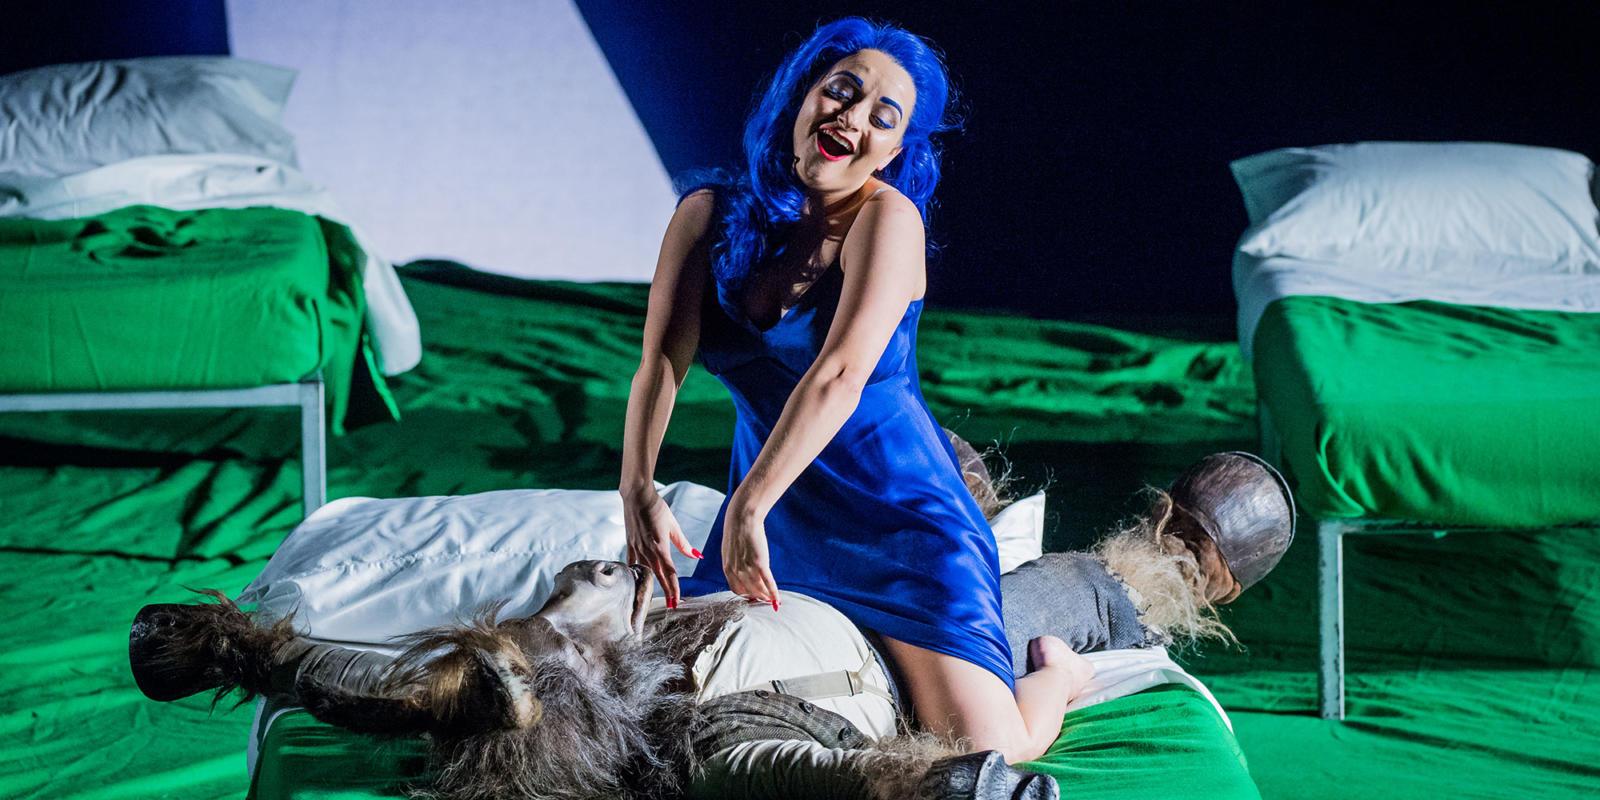 Soraya Mafi as Tytania in our 2017/18 season production of Britten's A Midsummer Night's Dream.